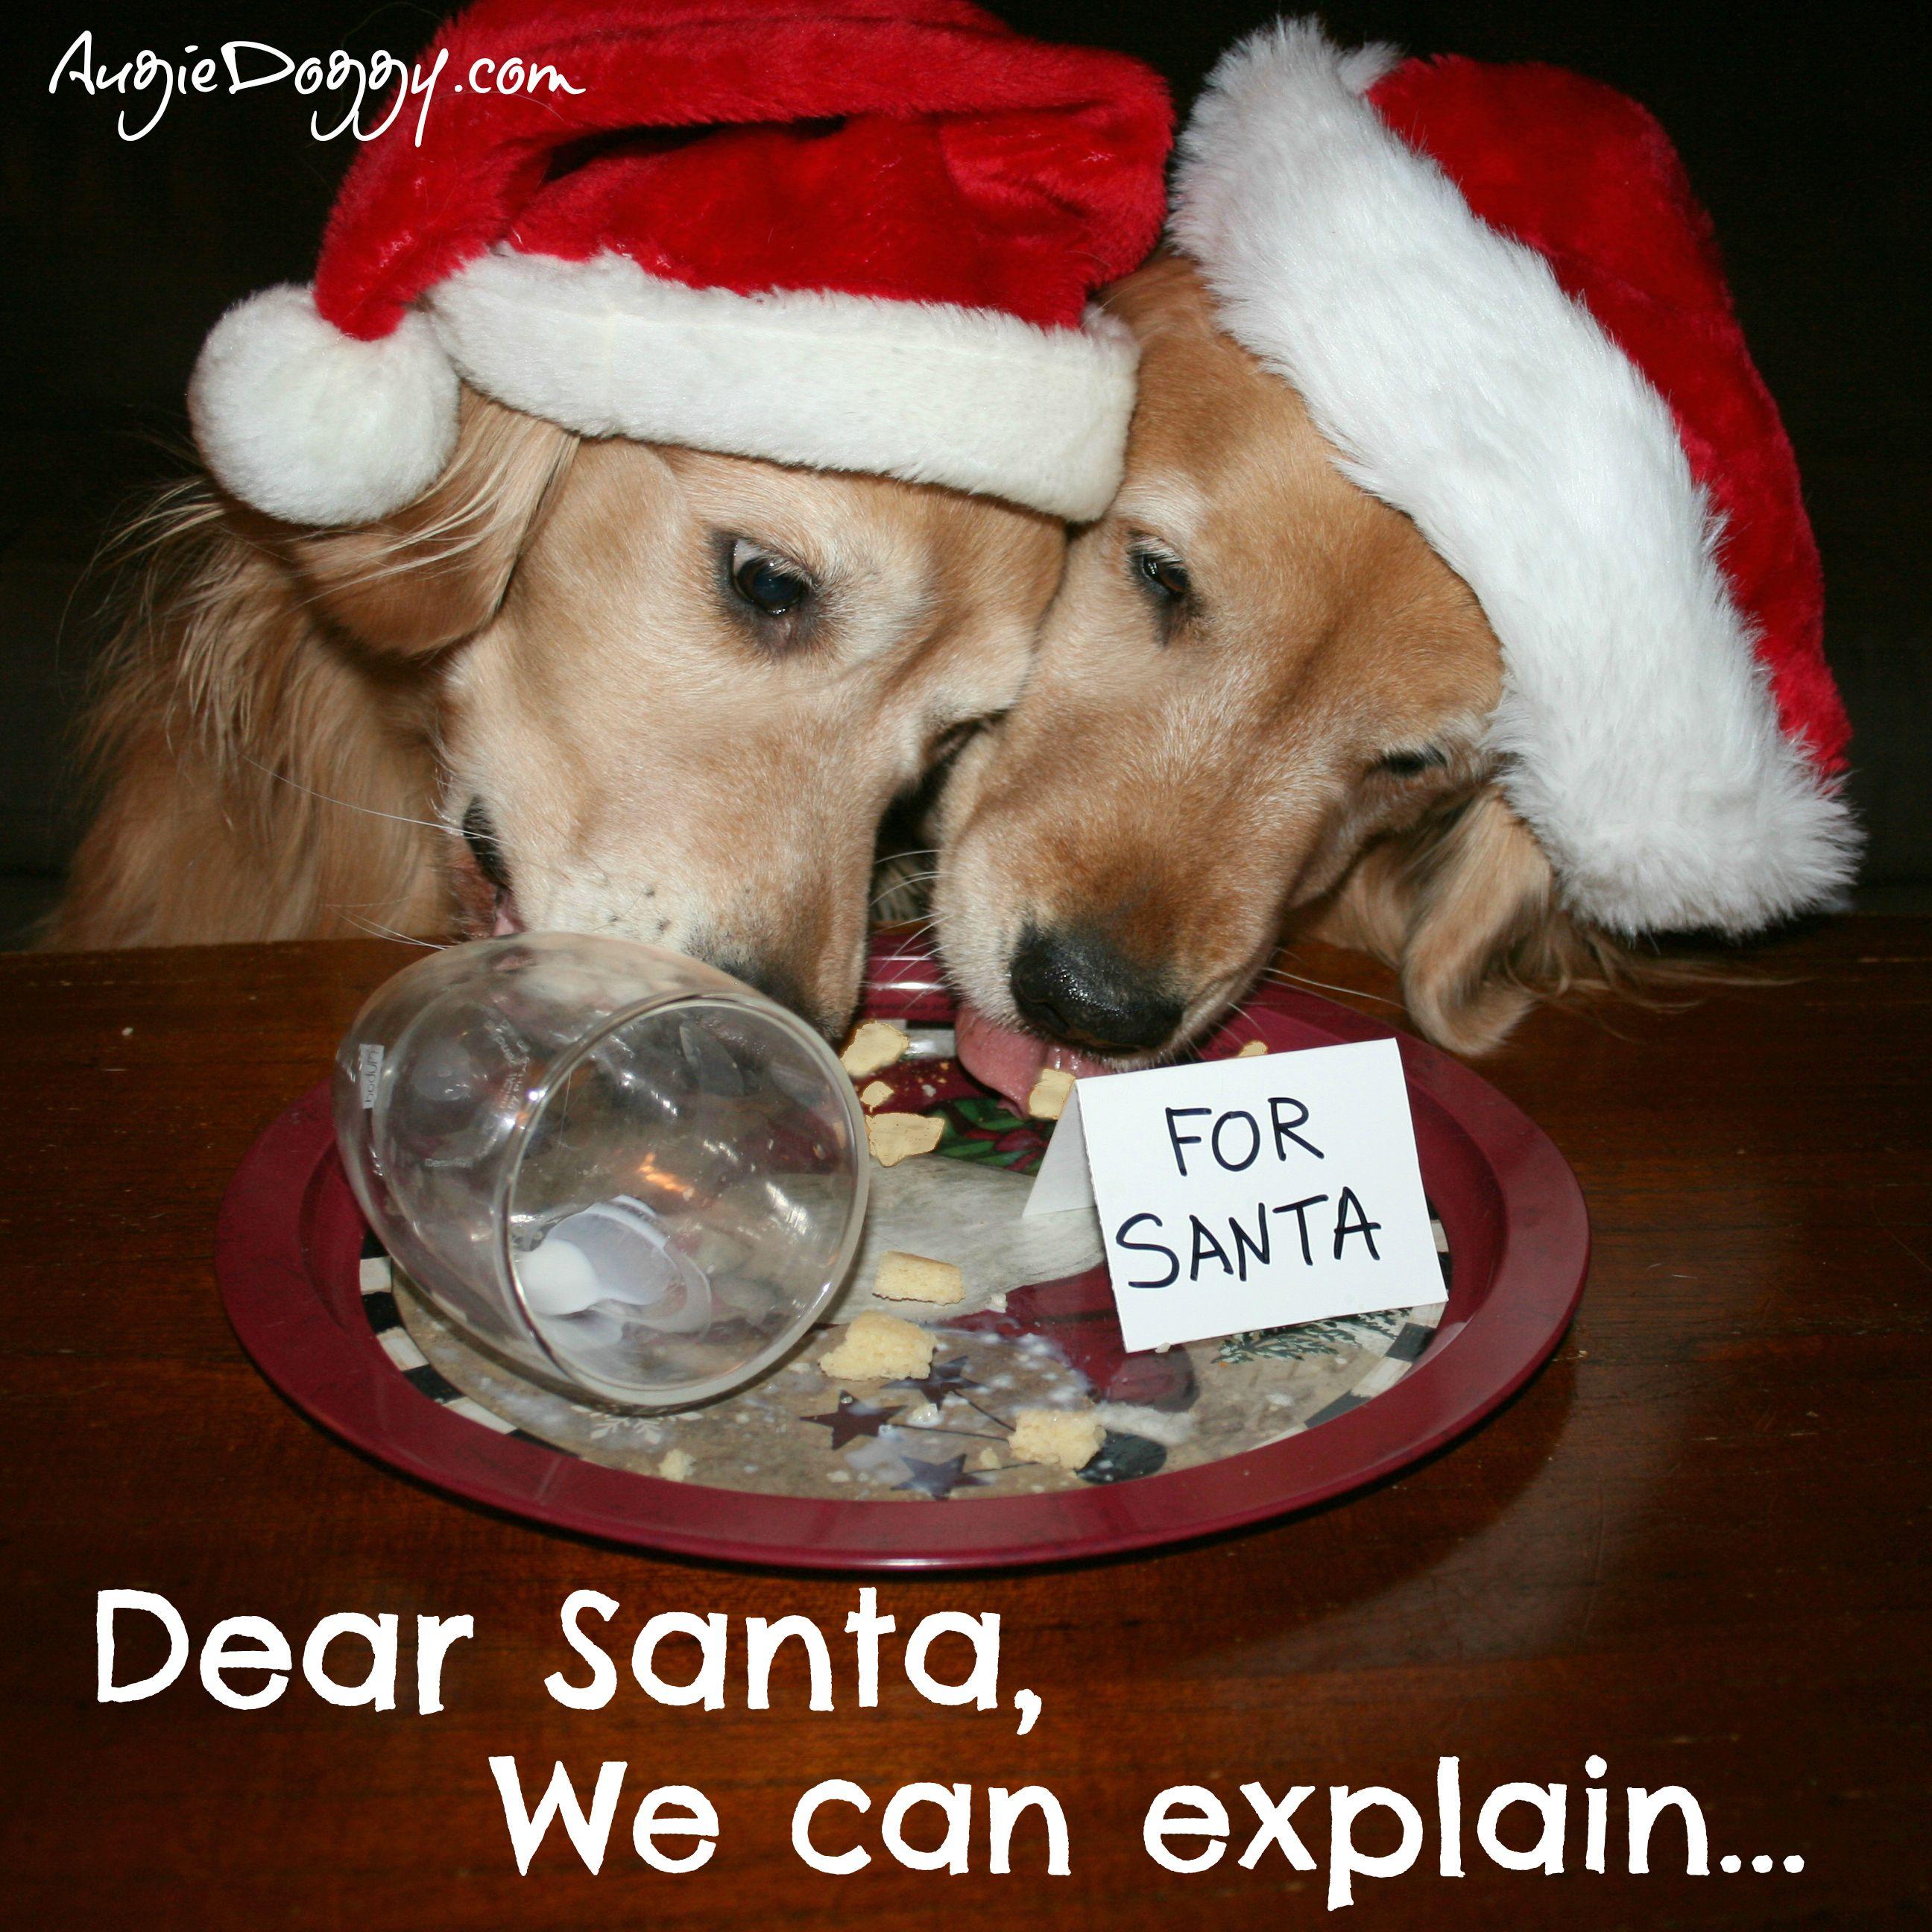 a47ad70ba45 Golden Retrievers with Santa Hats. Funny Christmas design! Dear Santa